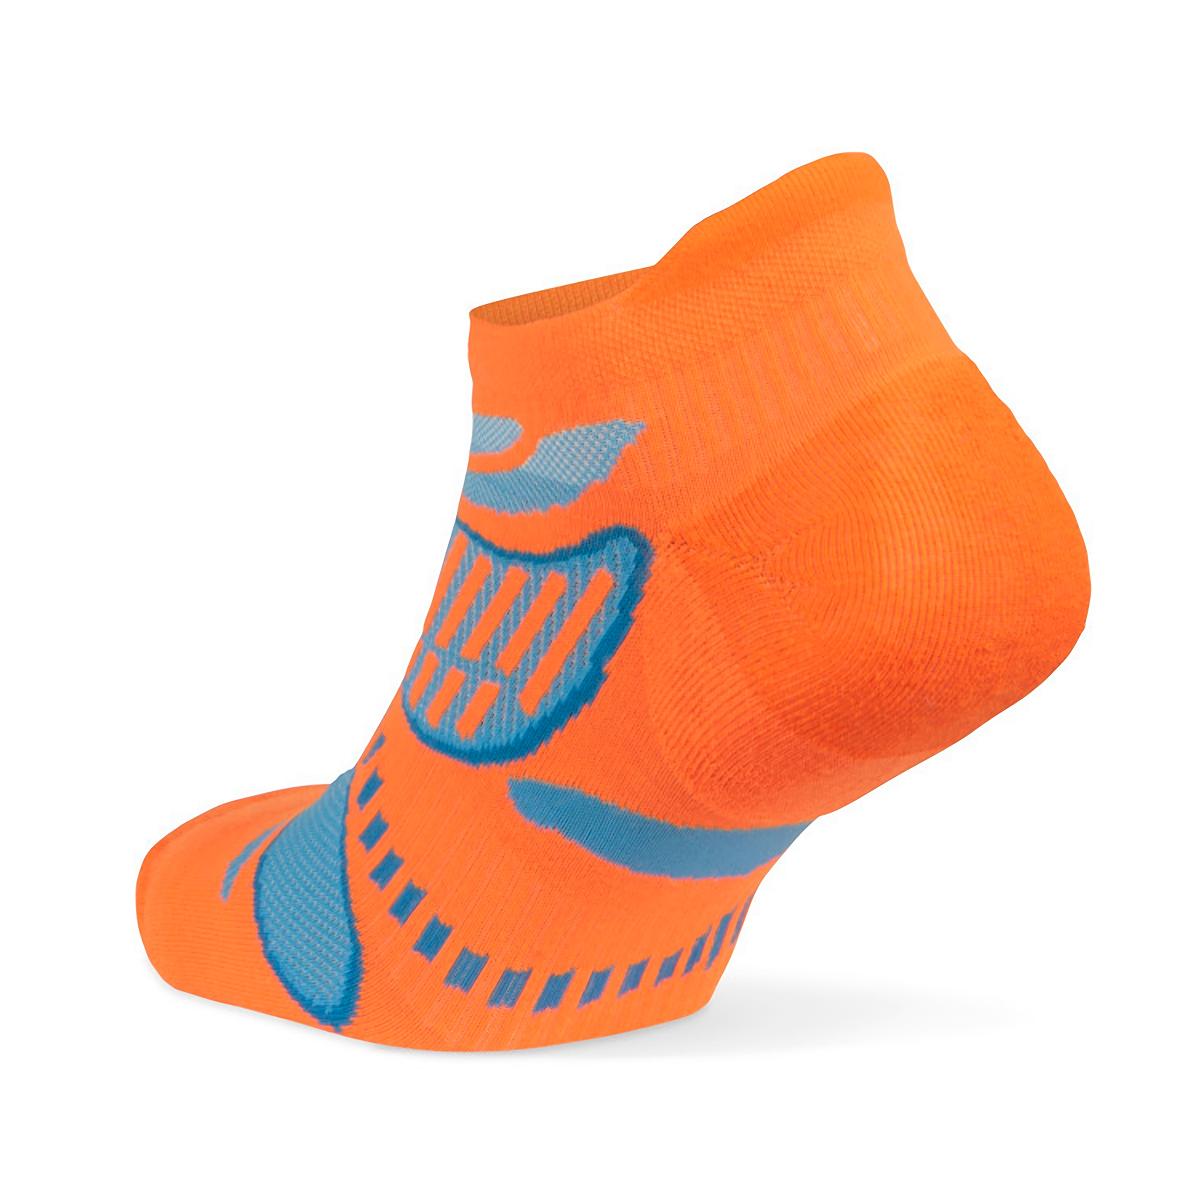 Balega Ultra Light No Show Tab Socks - Color: Flu Orange - Size: S, Flu Orange, large, image 2